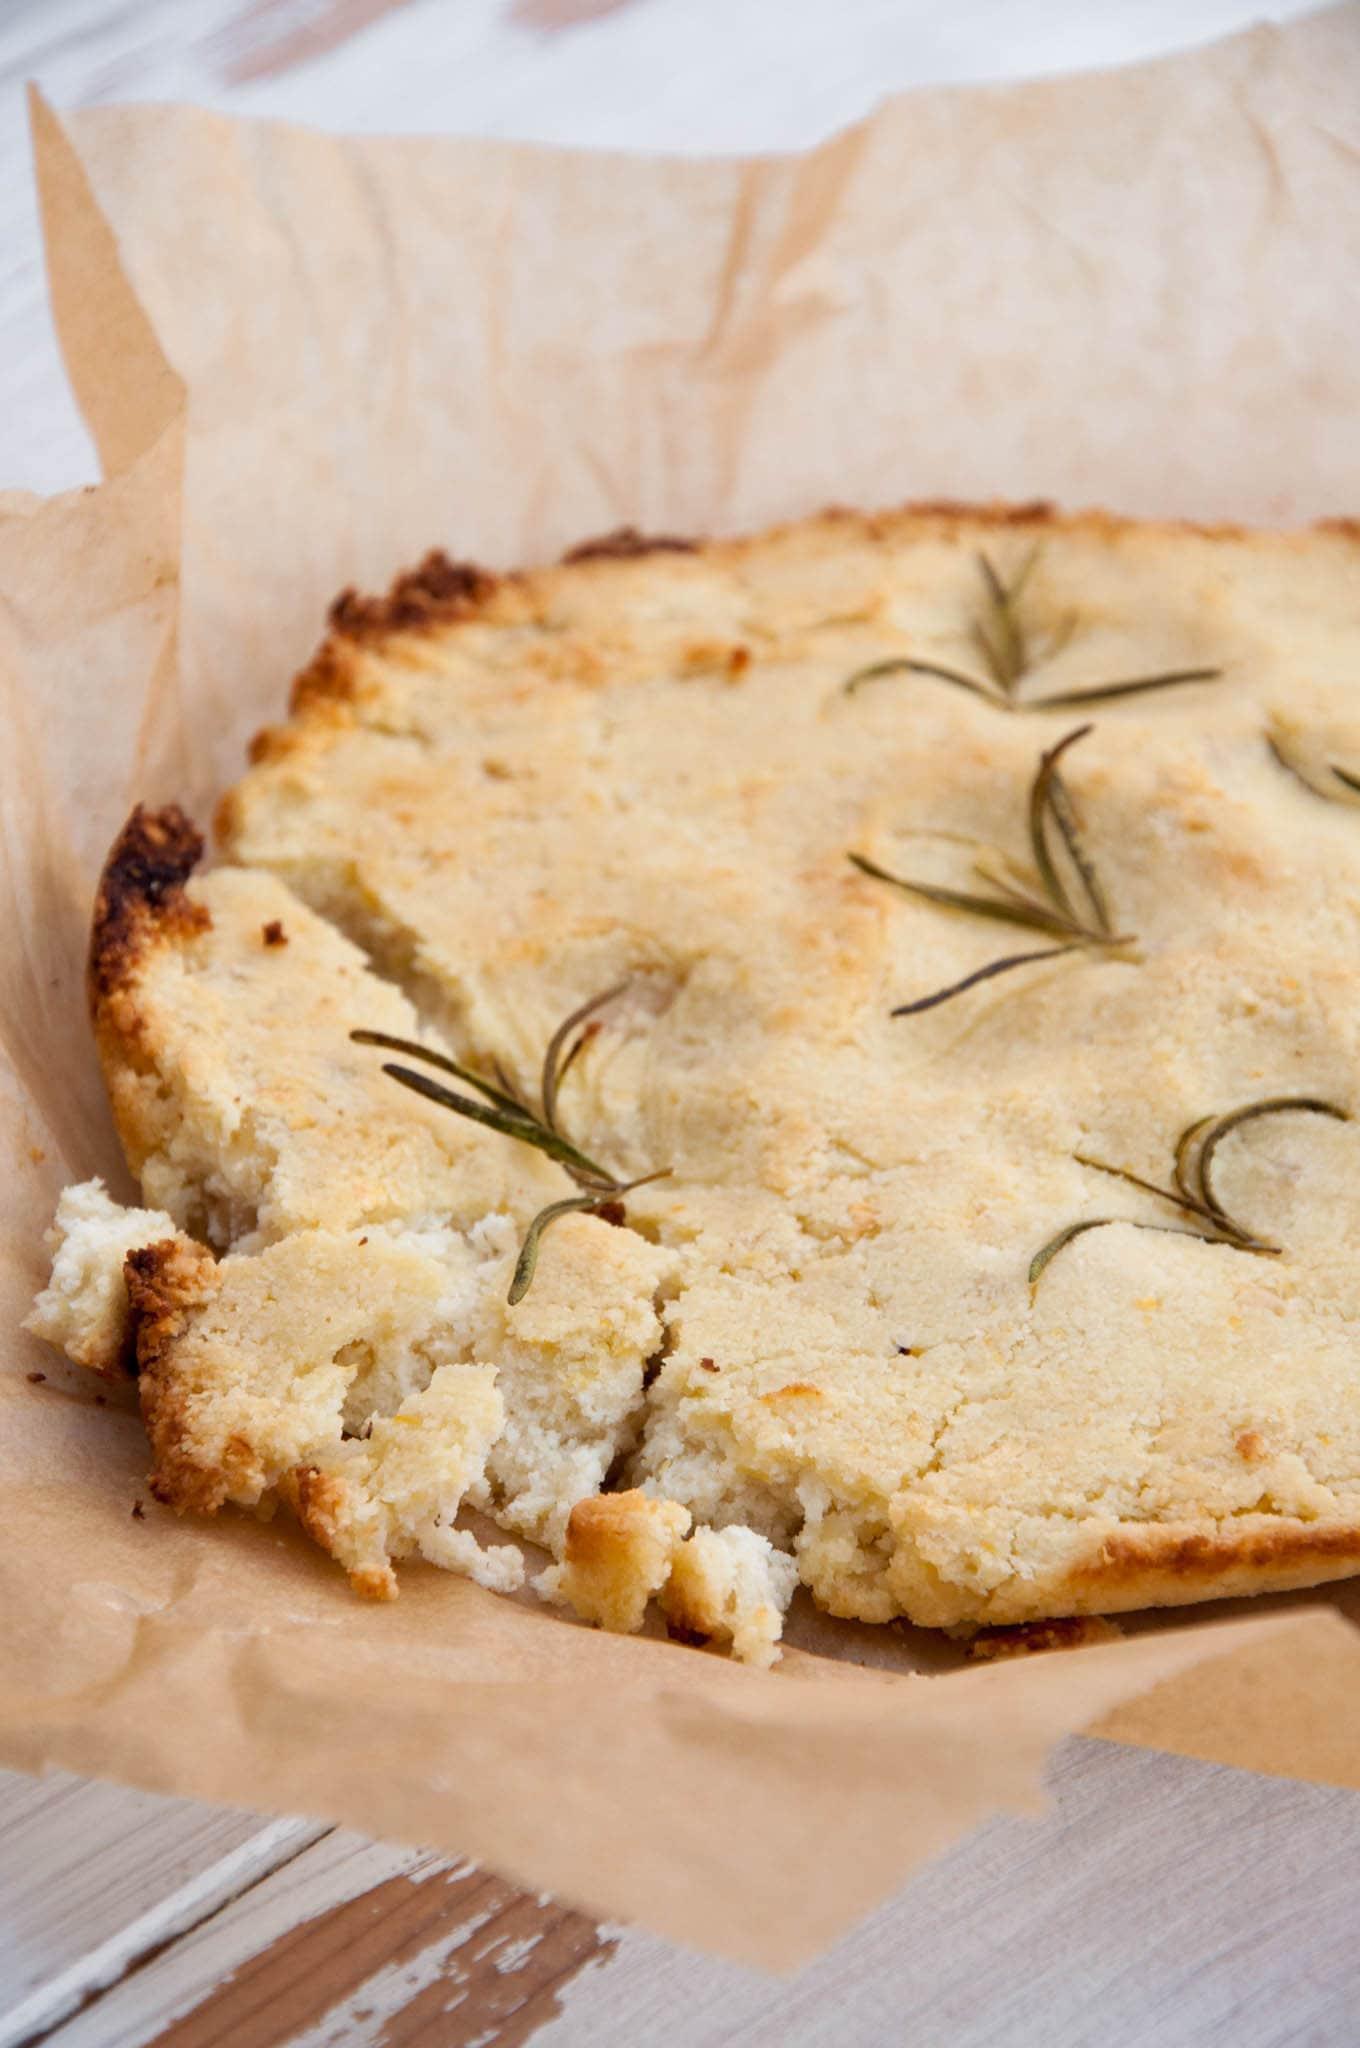 Baked Almond Feta with Rosemary | ElephantasticVegan.com